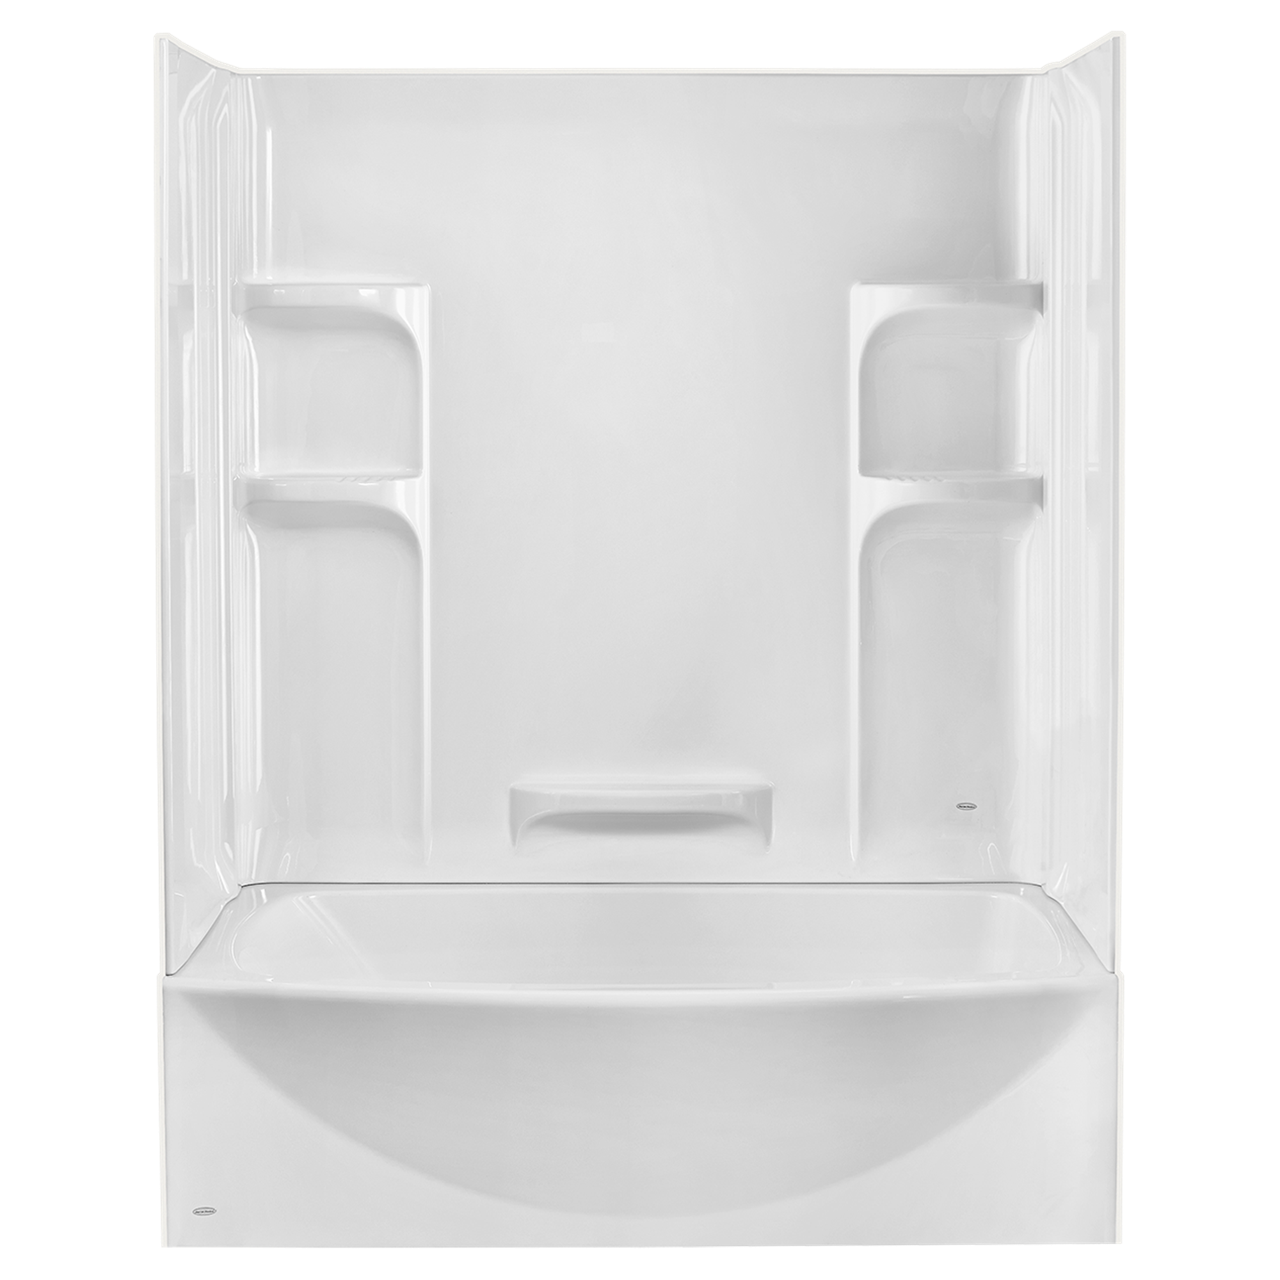 Tub And Shower Walls Ovation Curved 3 Piece Bathtub Wall